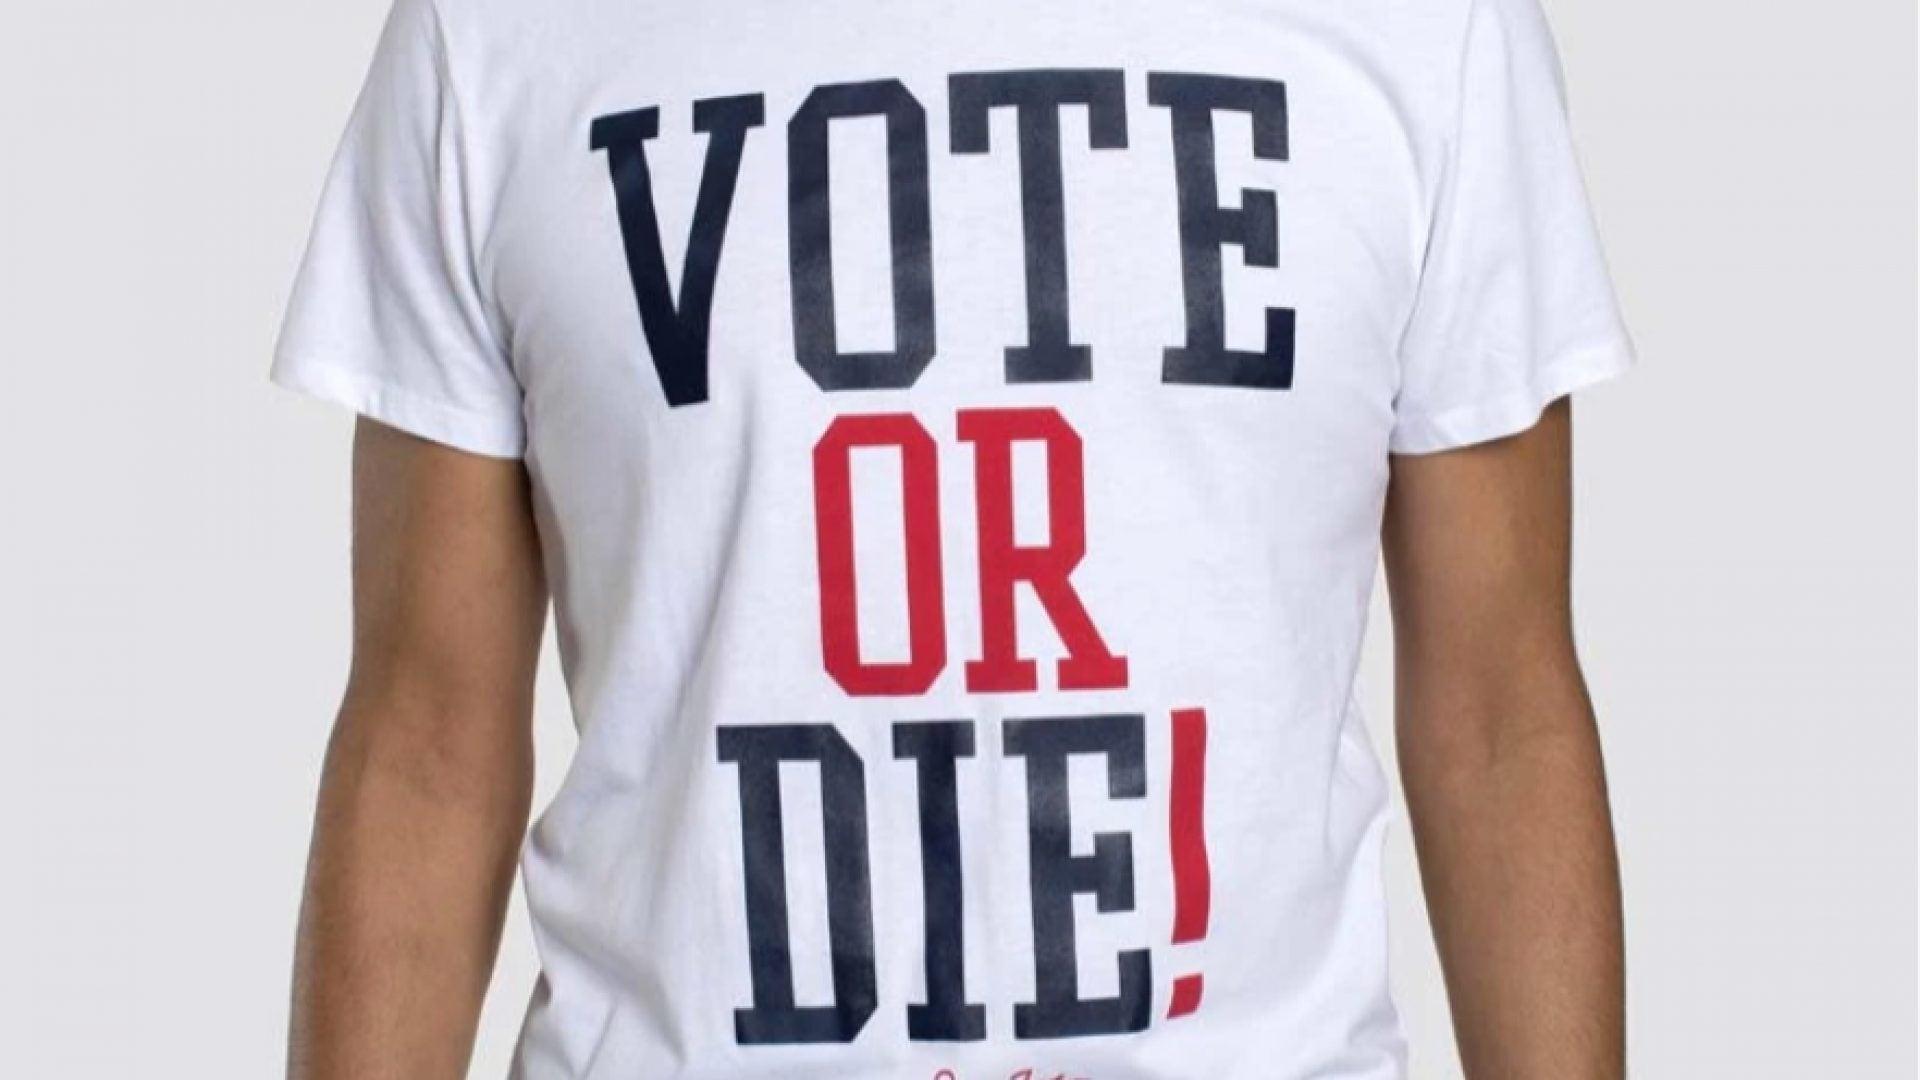 "Sean Jean Relaunches Popular 'Vote Or Die"" Tee"